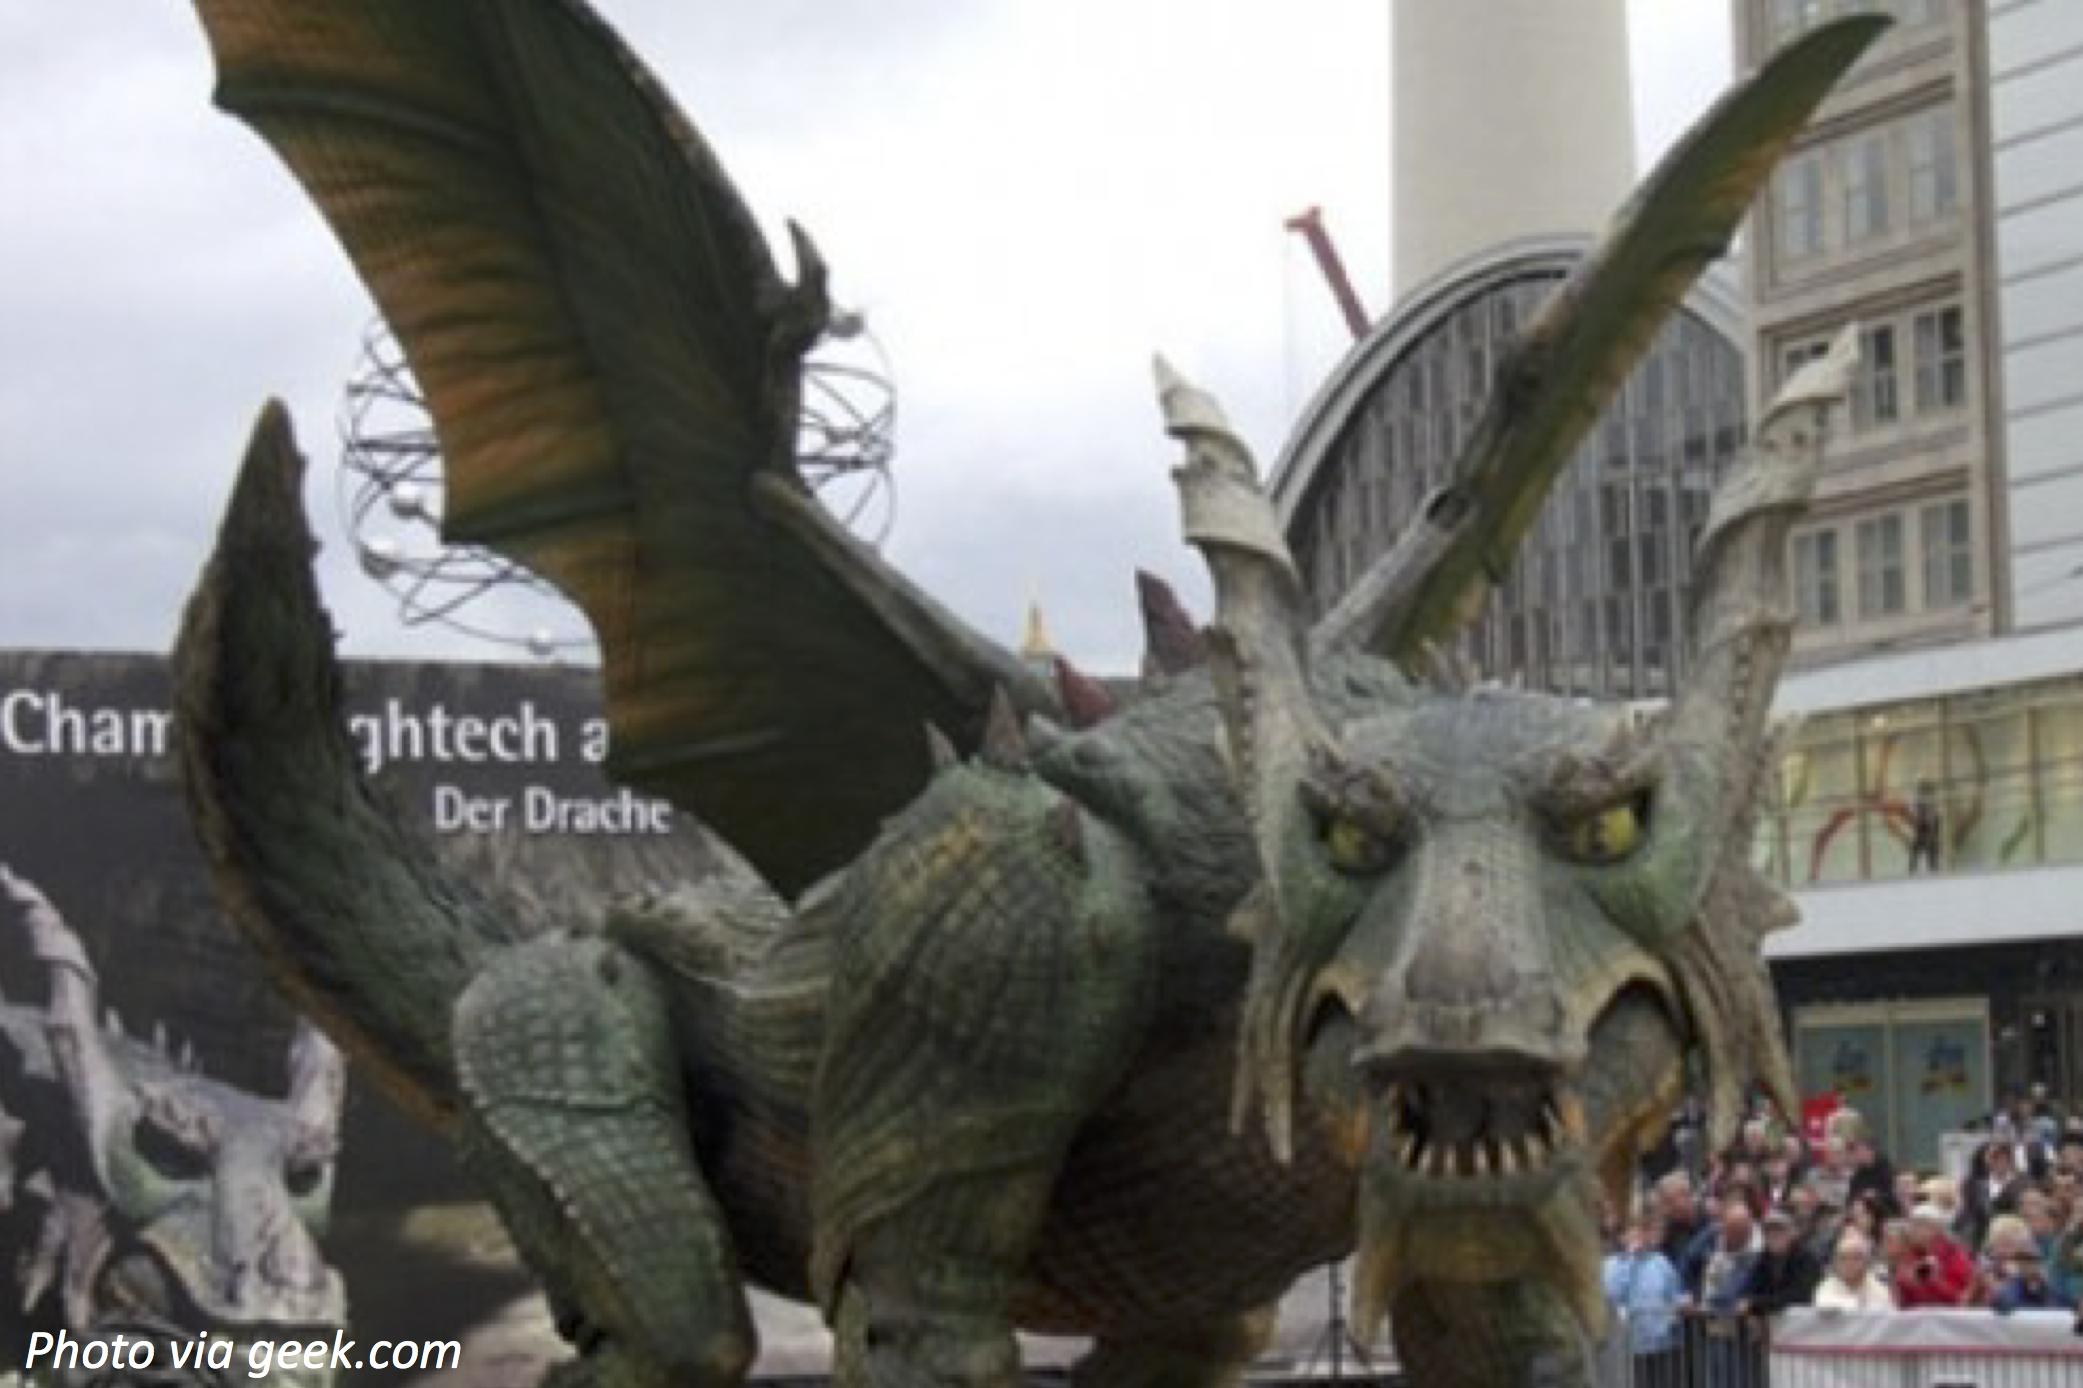 Giant Robotic Dragon